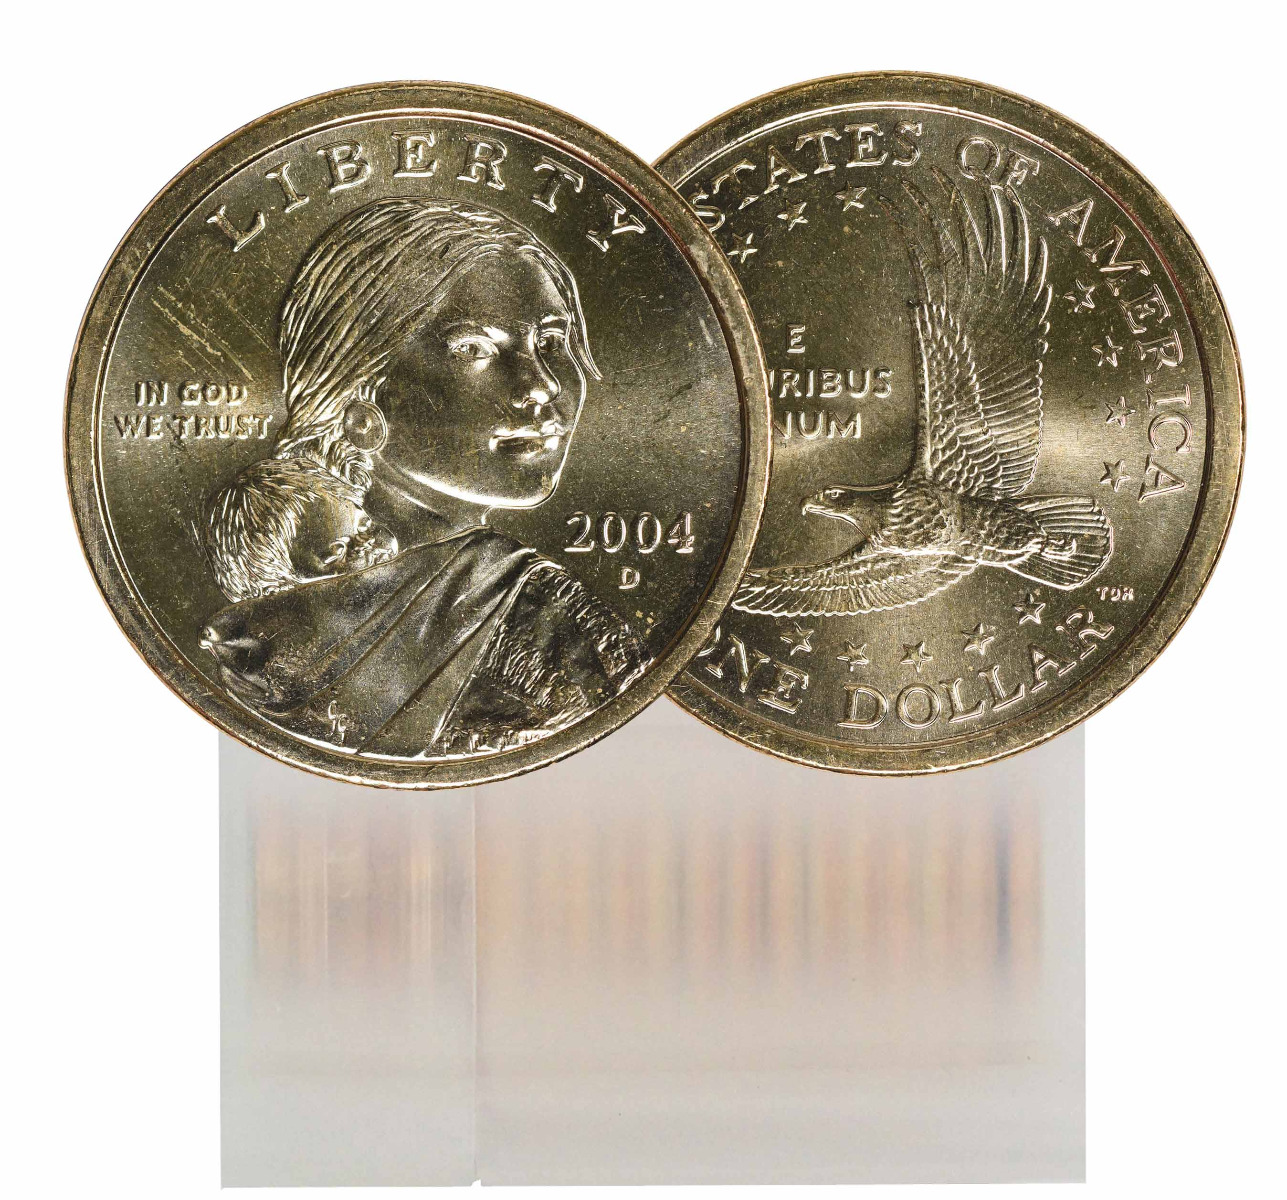 2004-D BU Sacagawea Dollar 25-Coin Roll